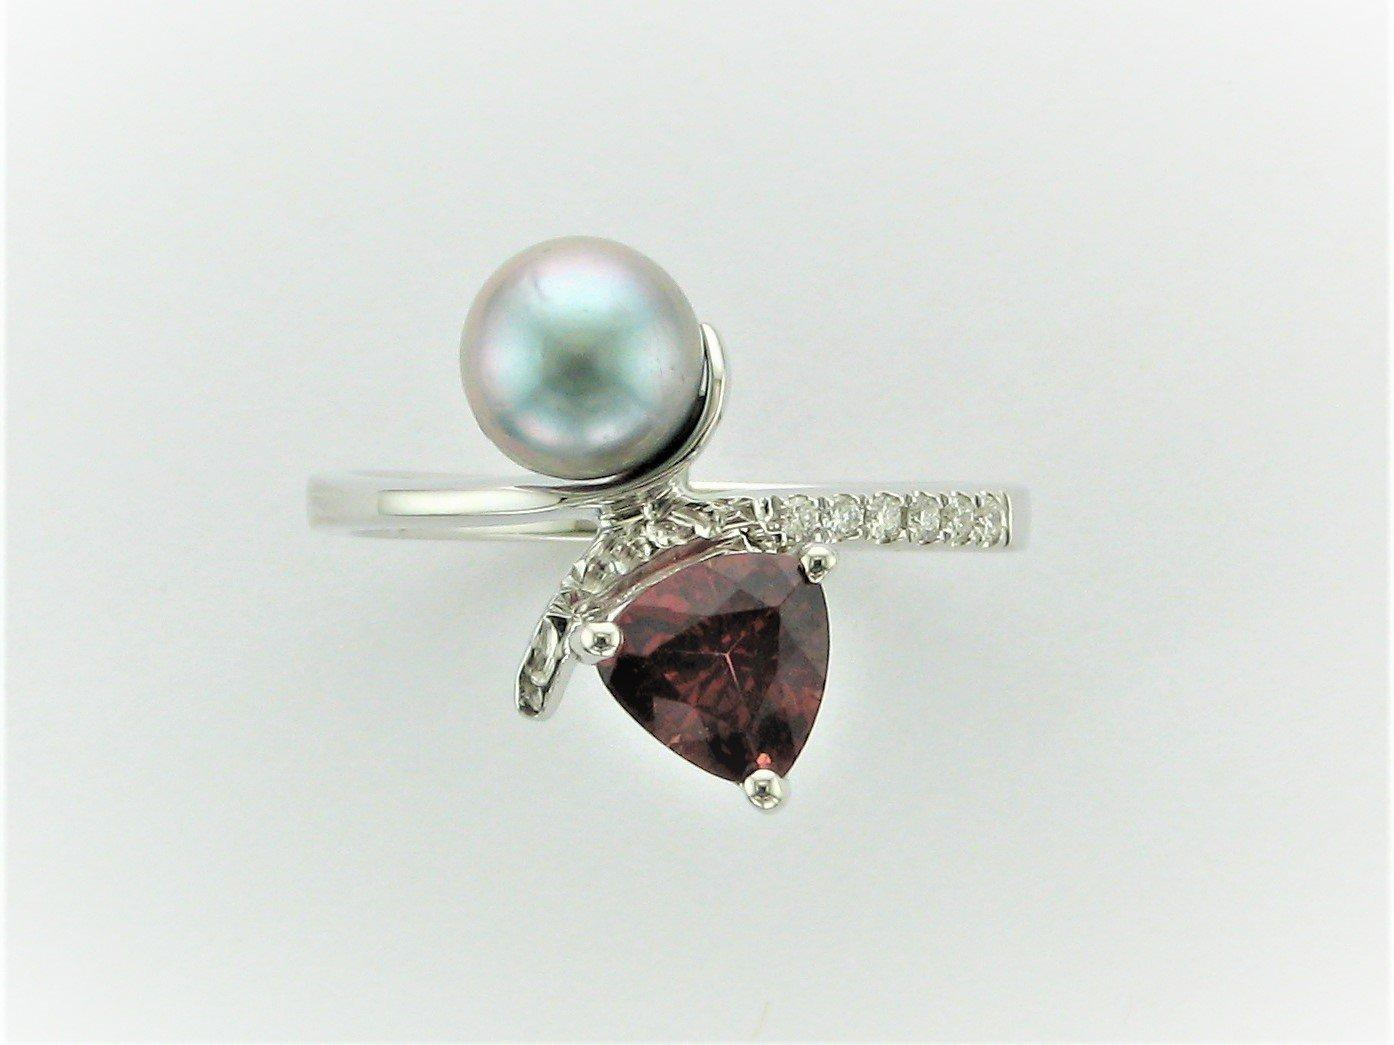 1.08 Rhodolite Garnet and 6mm Grey Pearl and Diamond Ring Set in 14 Karat White Gold